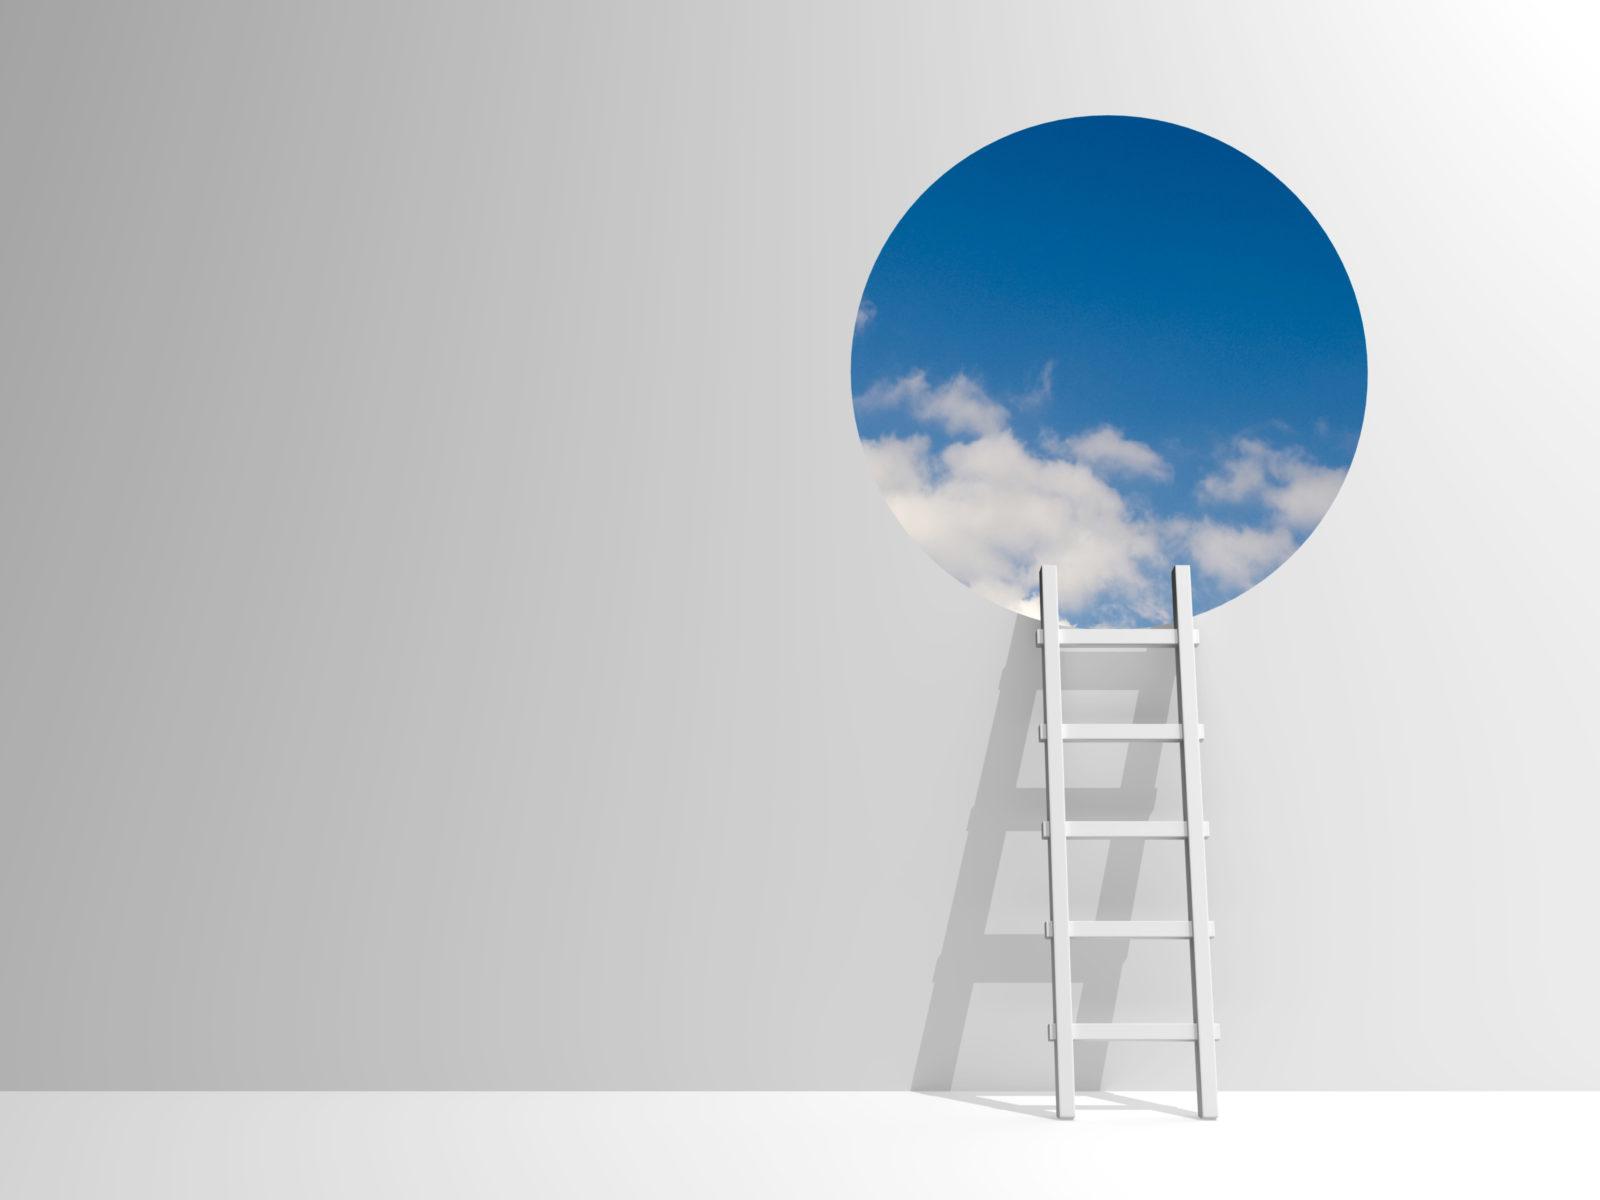 Skills Based Hiring Career Ladder